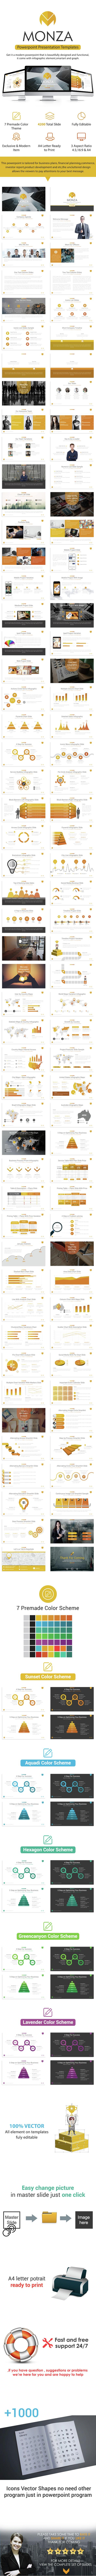 MONZA - Presentation Template - Clean & Modern